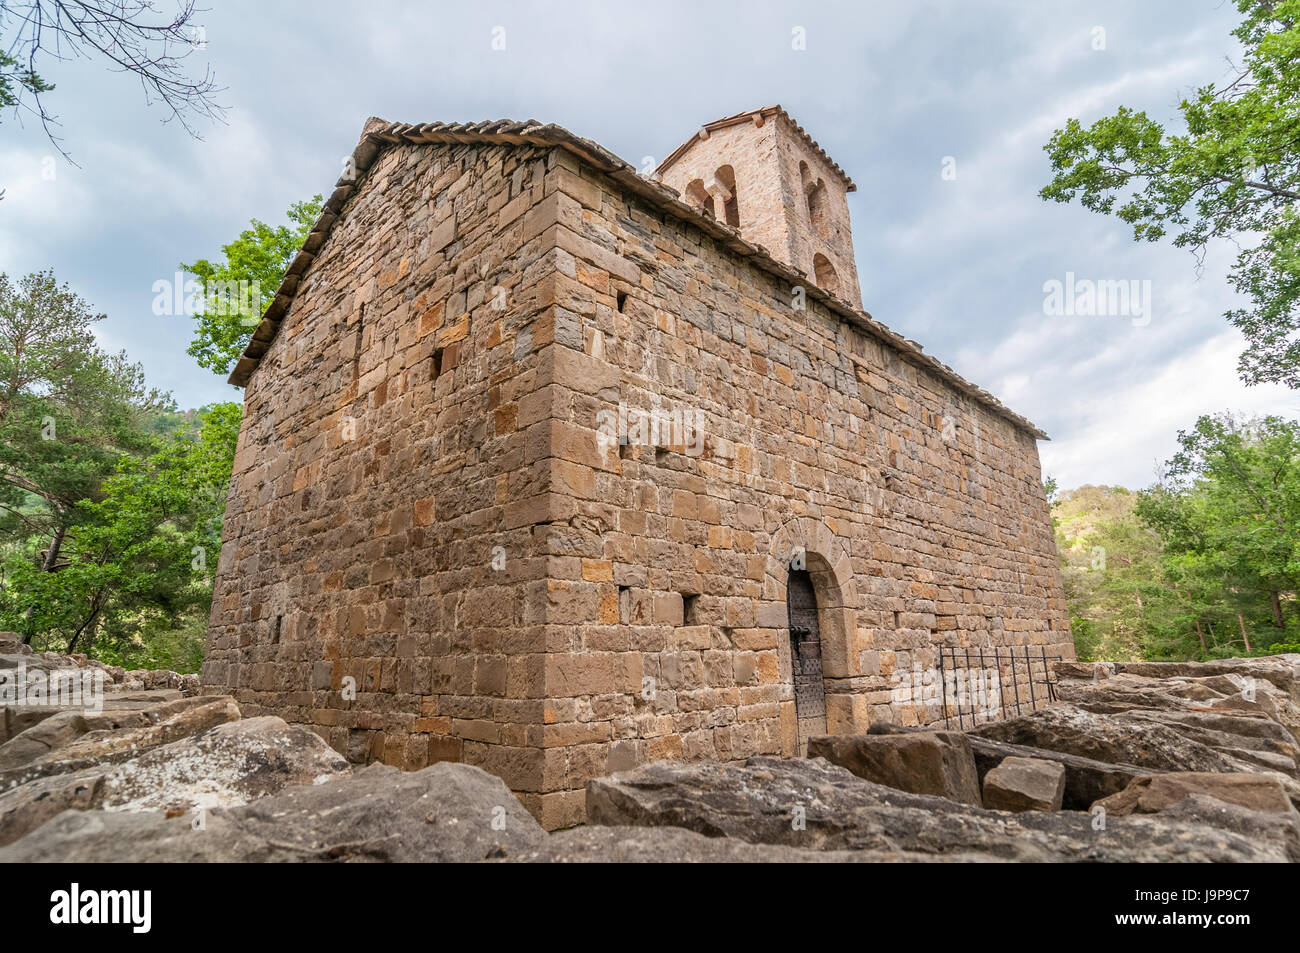 Sant Sadurni Rotgers church, romanesque church, Xi century, near Borredà, Catalonia, Spain - Stock Image